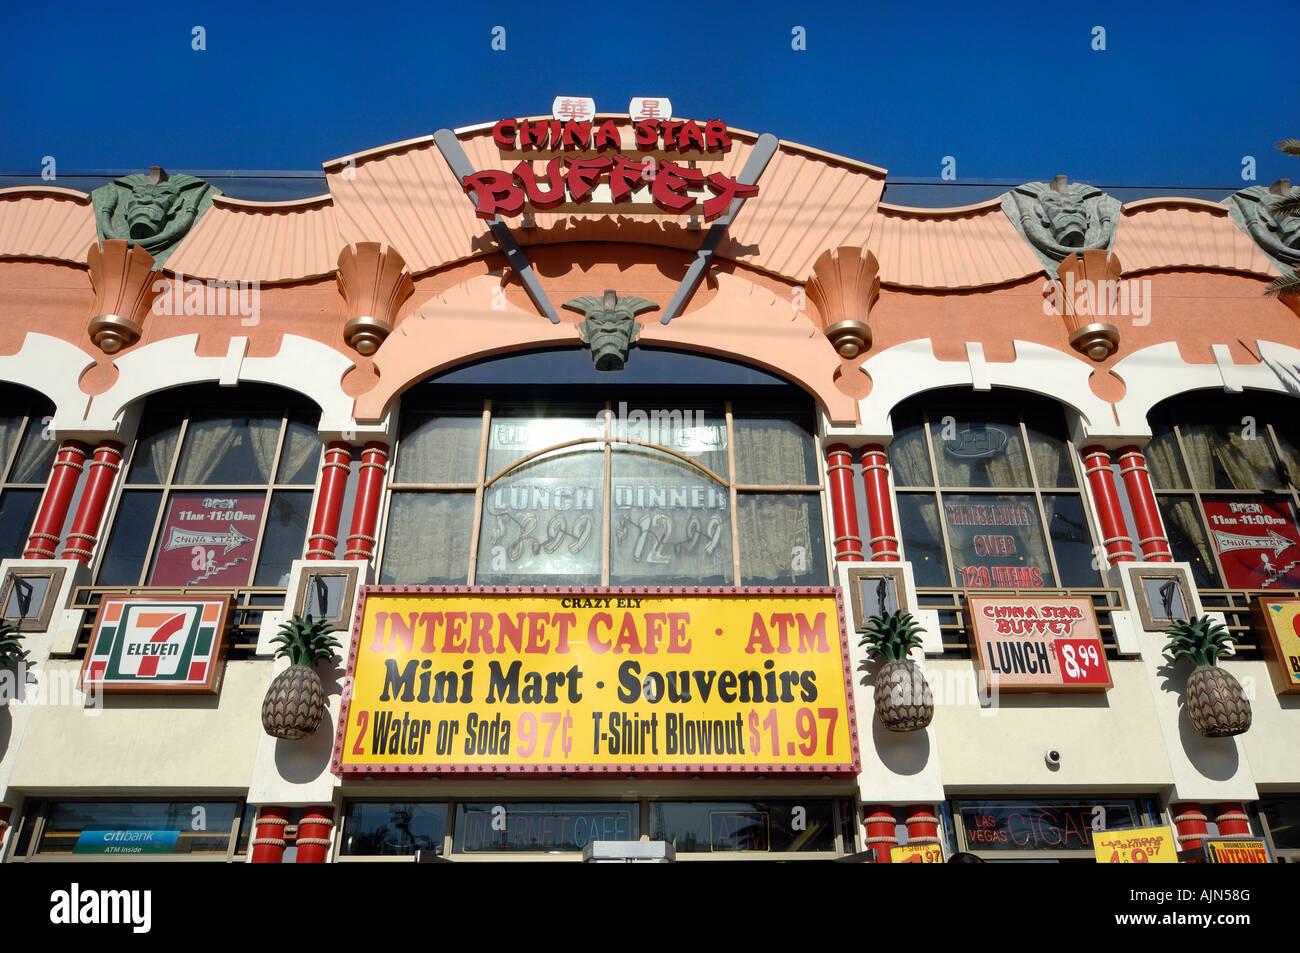 China Star Buffet Mini Mart Internet Cafe Las Vegas Strip Nevada Usa